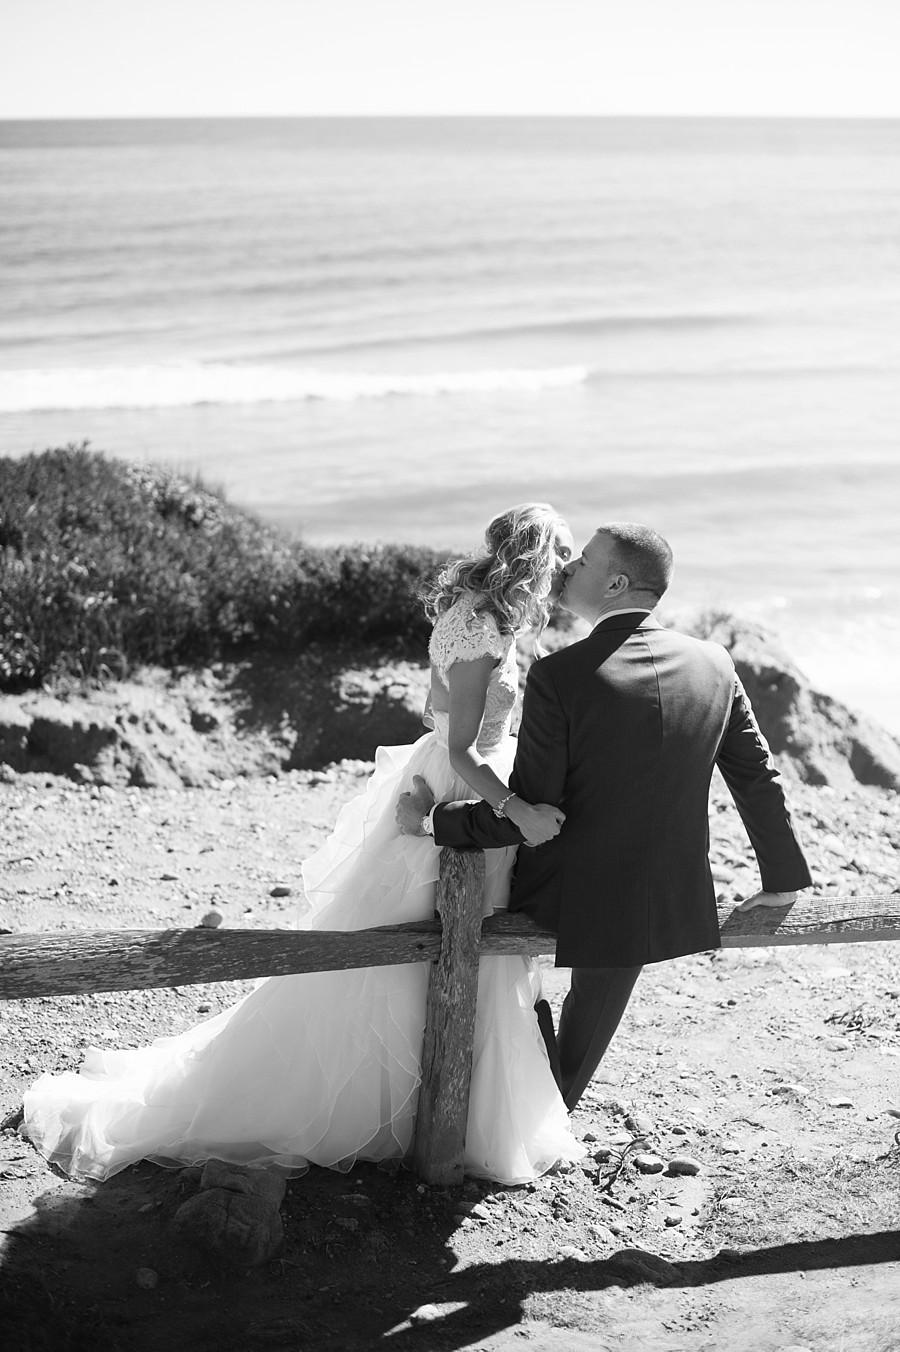 Sole_East_Montauk_Wedding_MS_31.jpg